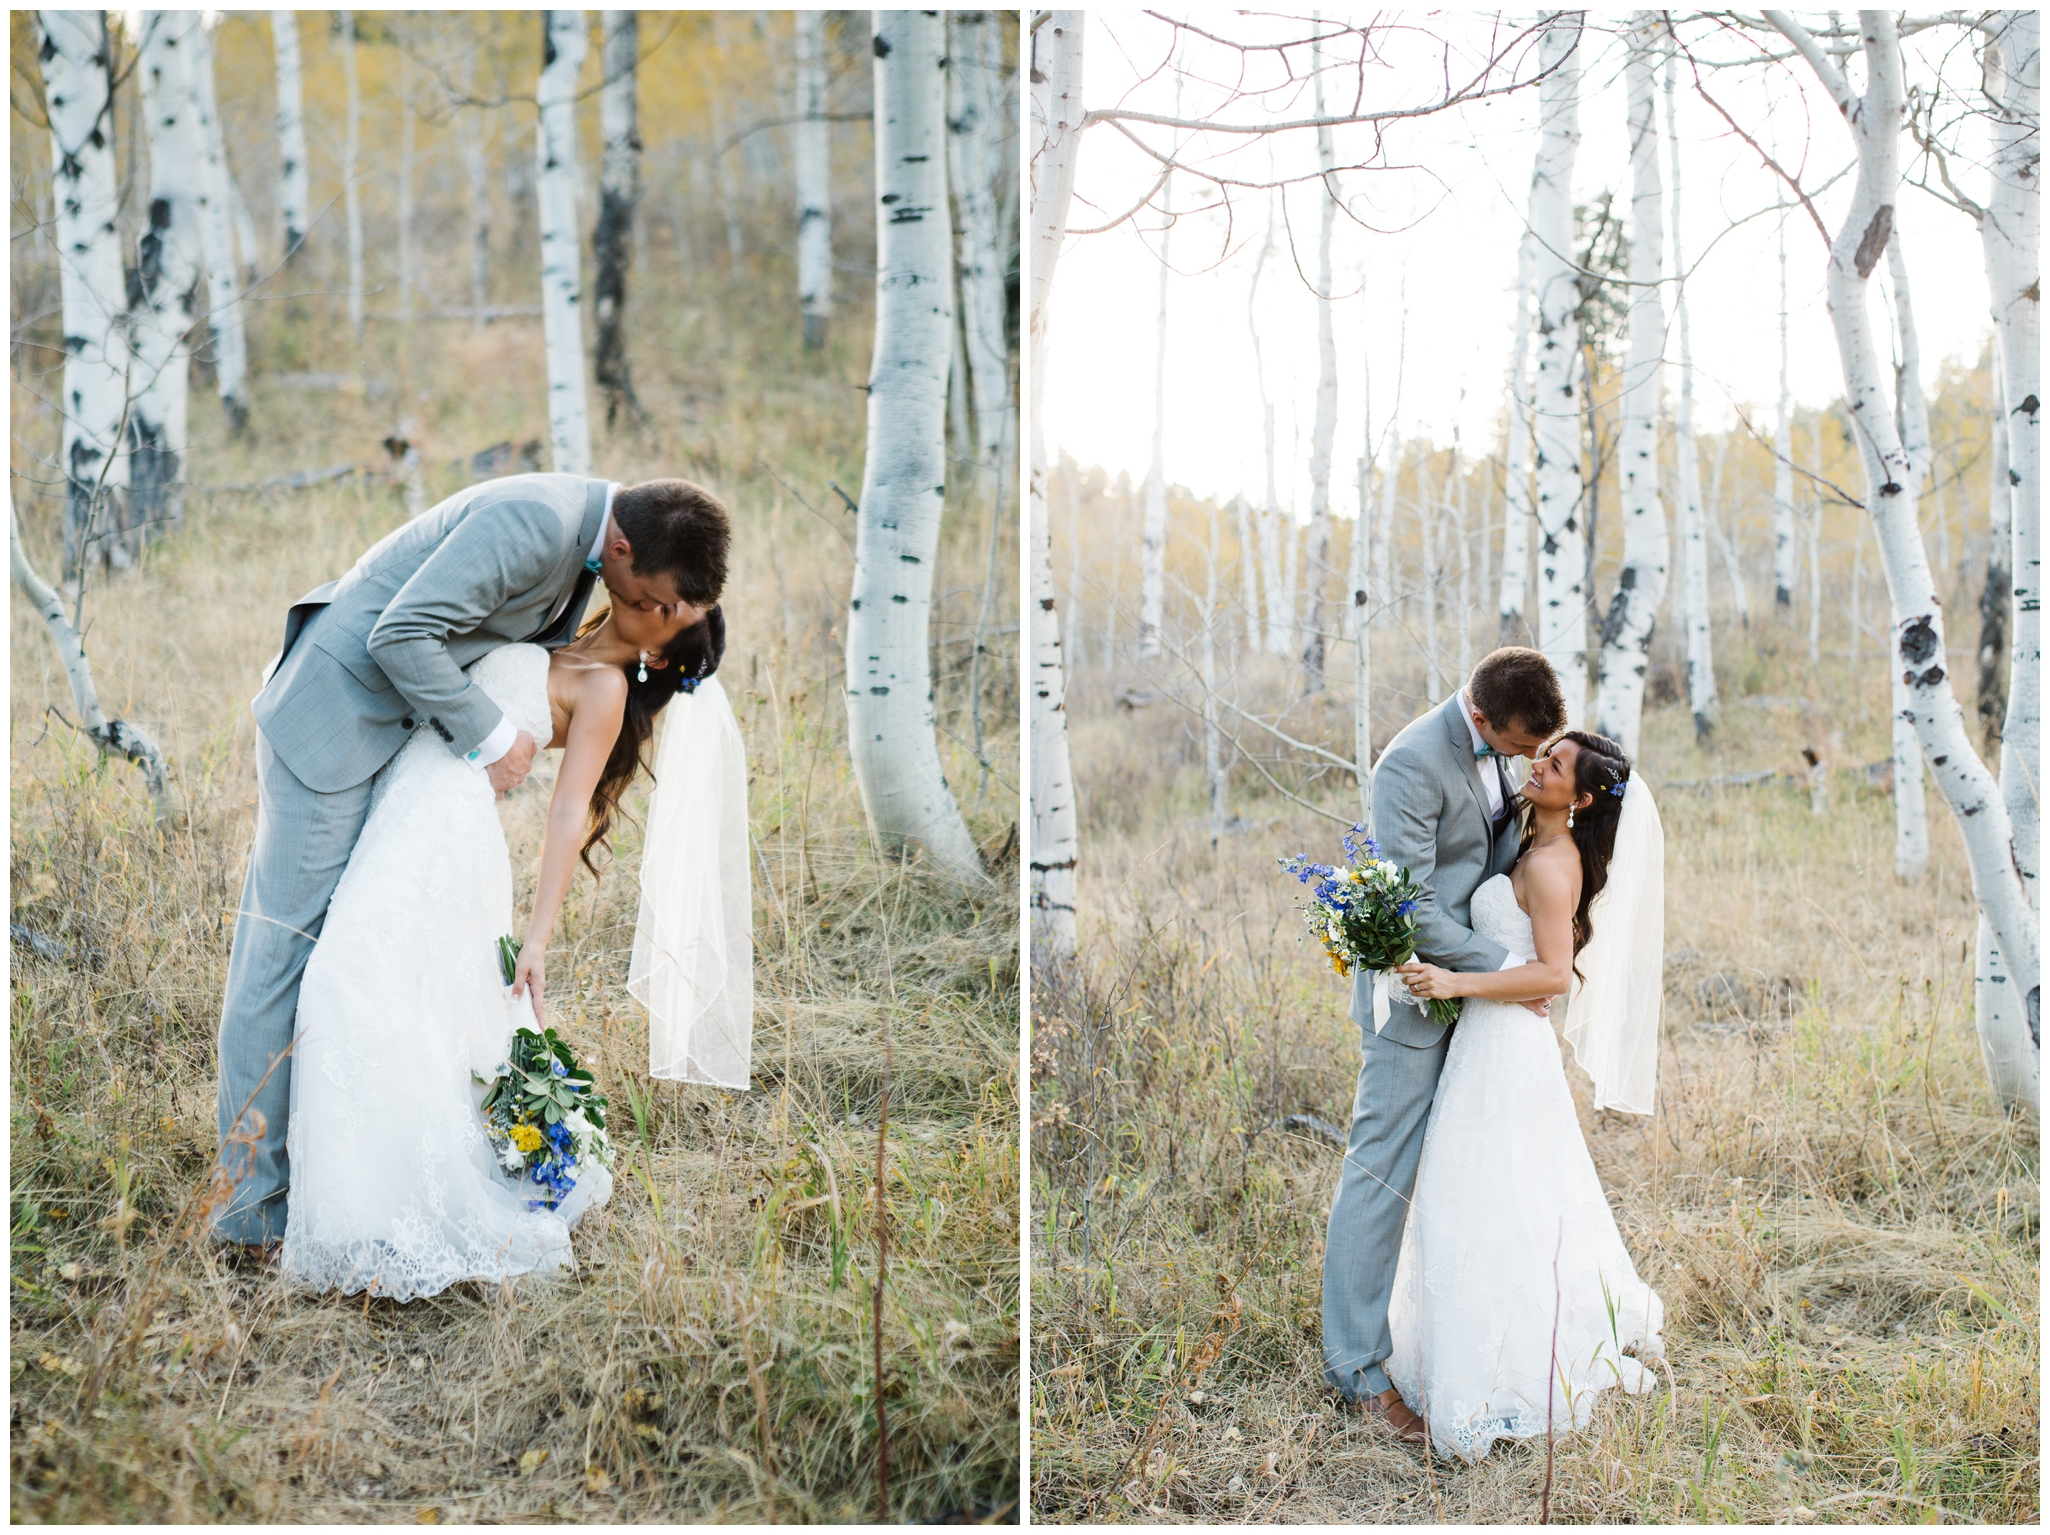 TysonHolly_Wedding_073.jpg